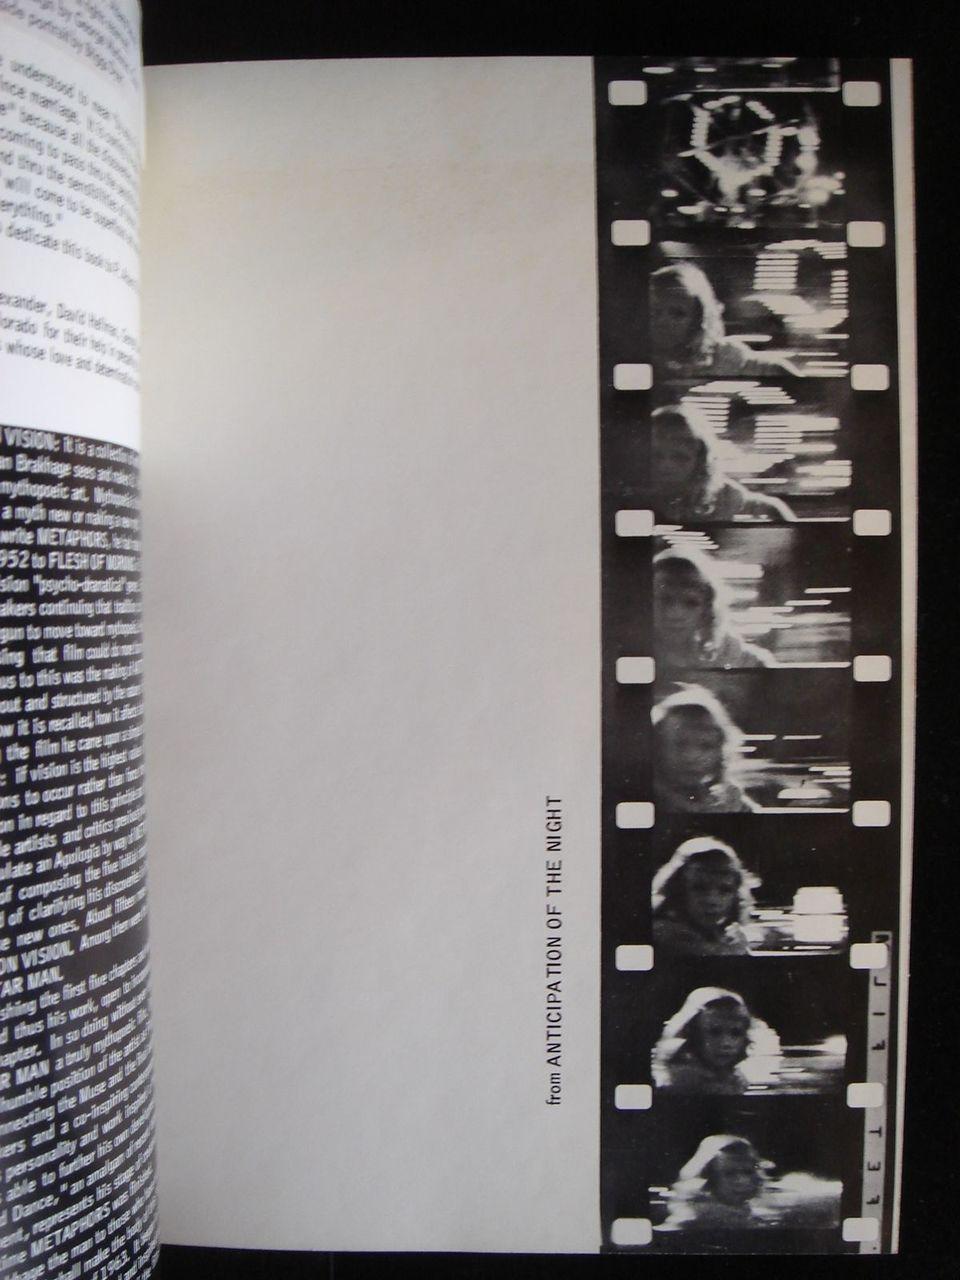 METAPHORS ON VISION, by Brakhage - 1976